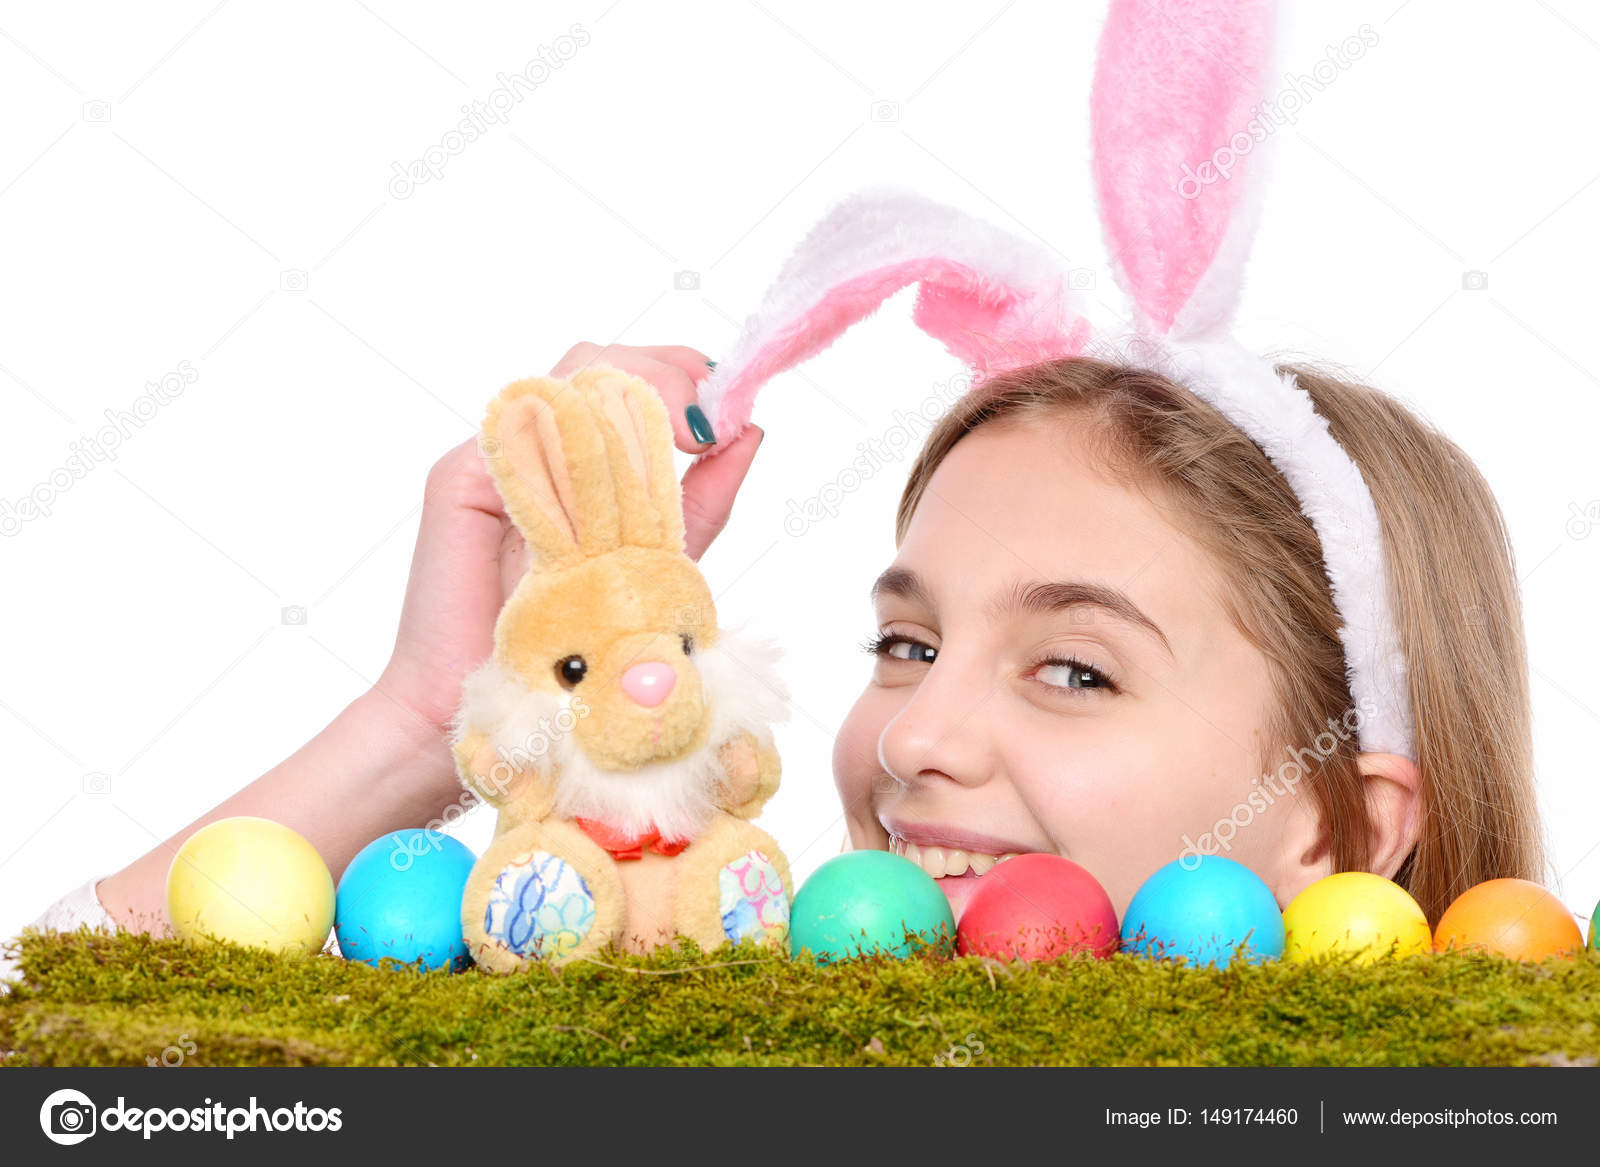 d64fad0753a Ευτυχισμένος κορίτσι Πάσχα στα αυτιά λαγουδάκι με πολύχρωμα αυγά, κουνέλι–  εικόνα αρχείου